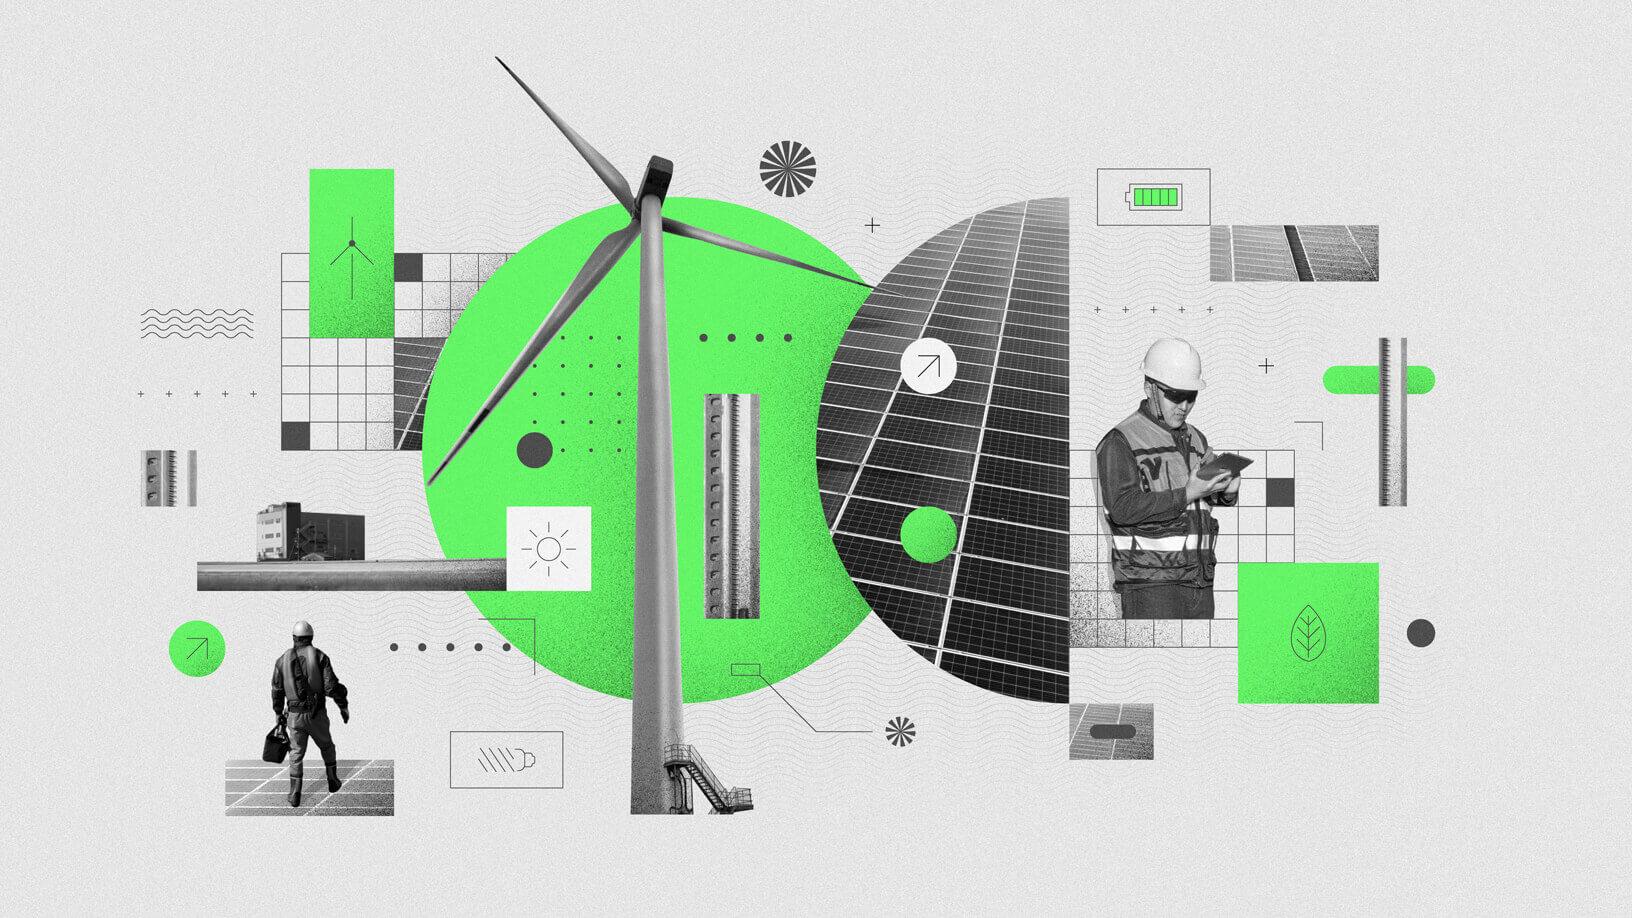 Saubere Energien bei Apple